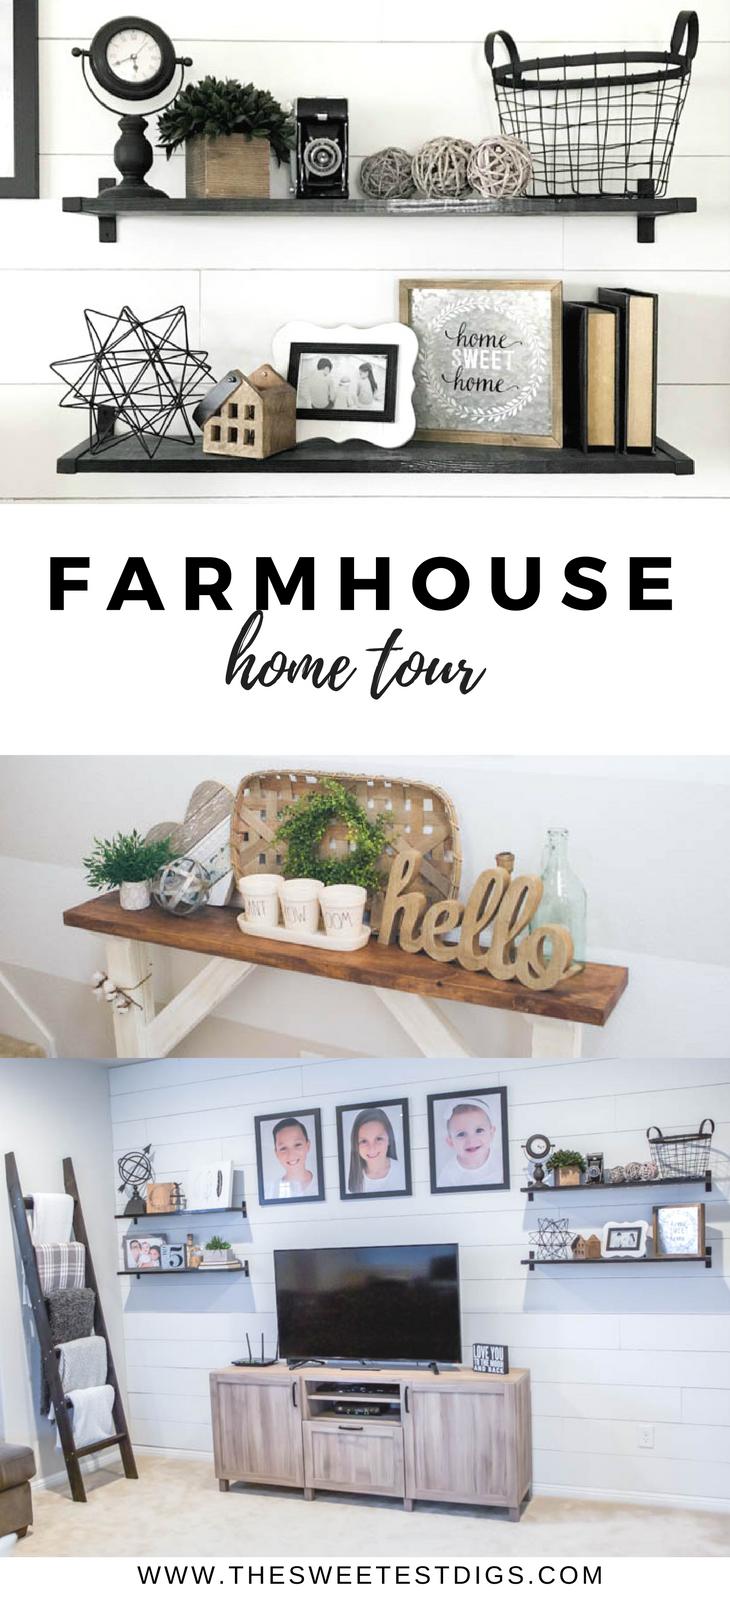 Marleyus modern farmhouse home tour modern farmhouse modern and room